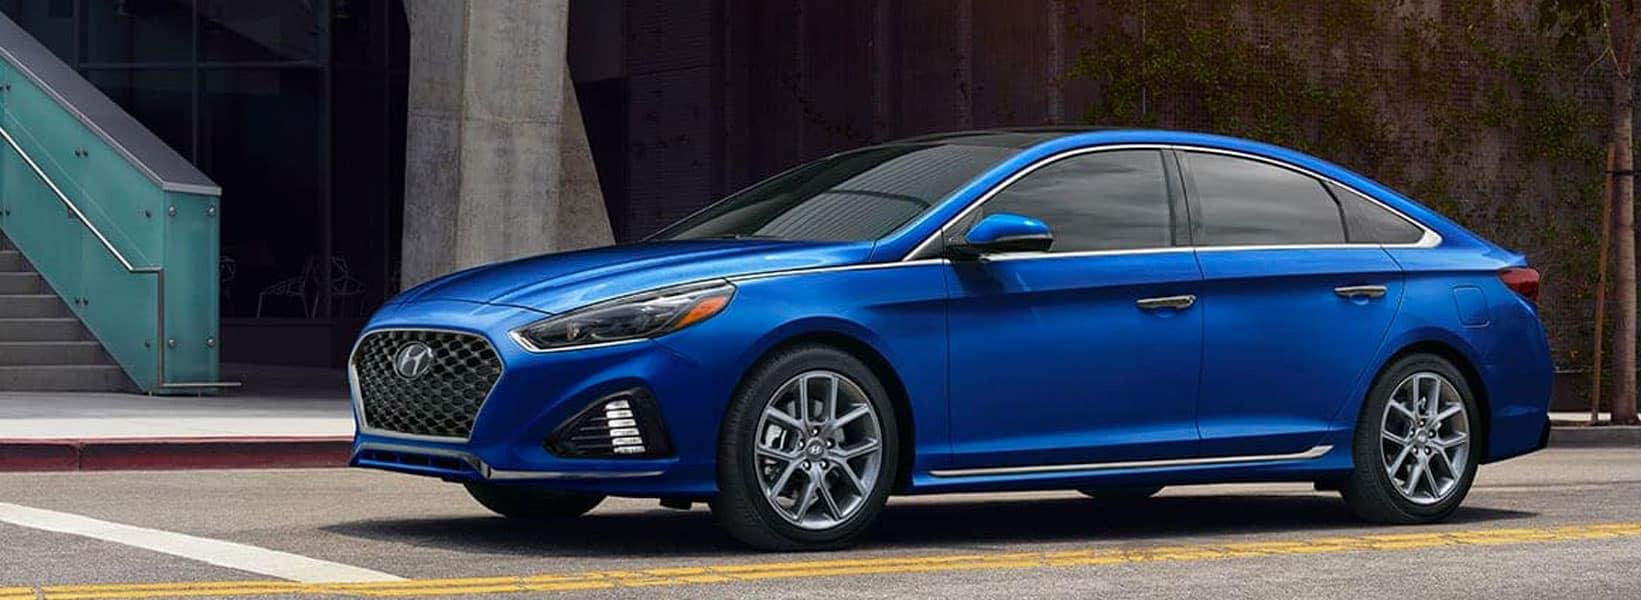 2019 Hyundai Sonata Reviews Chicago IL